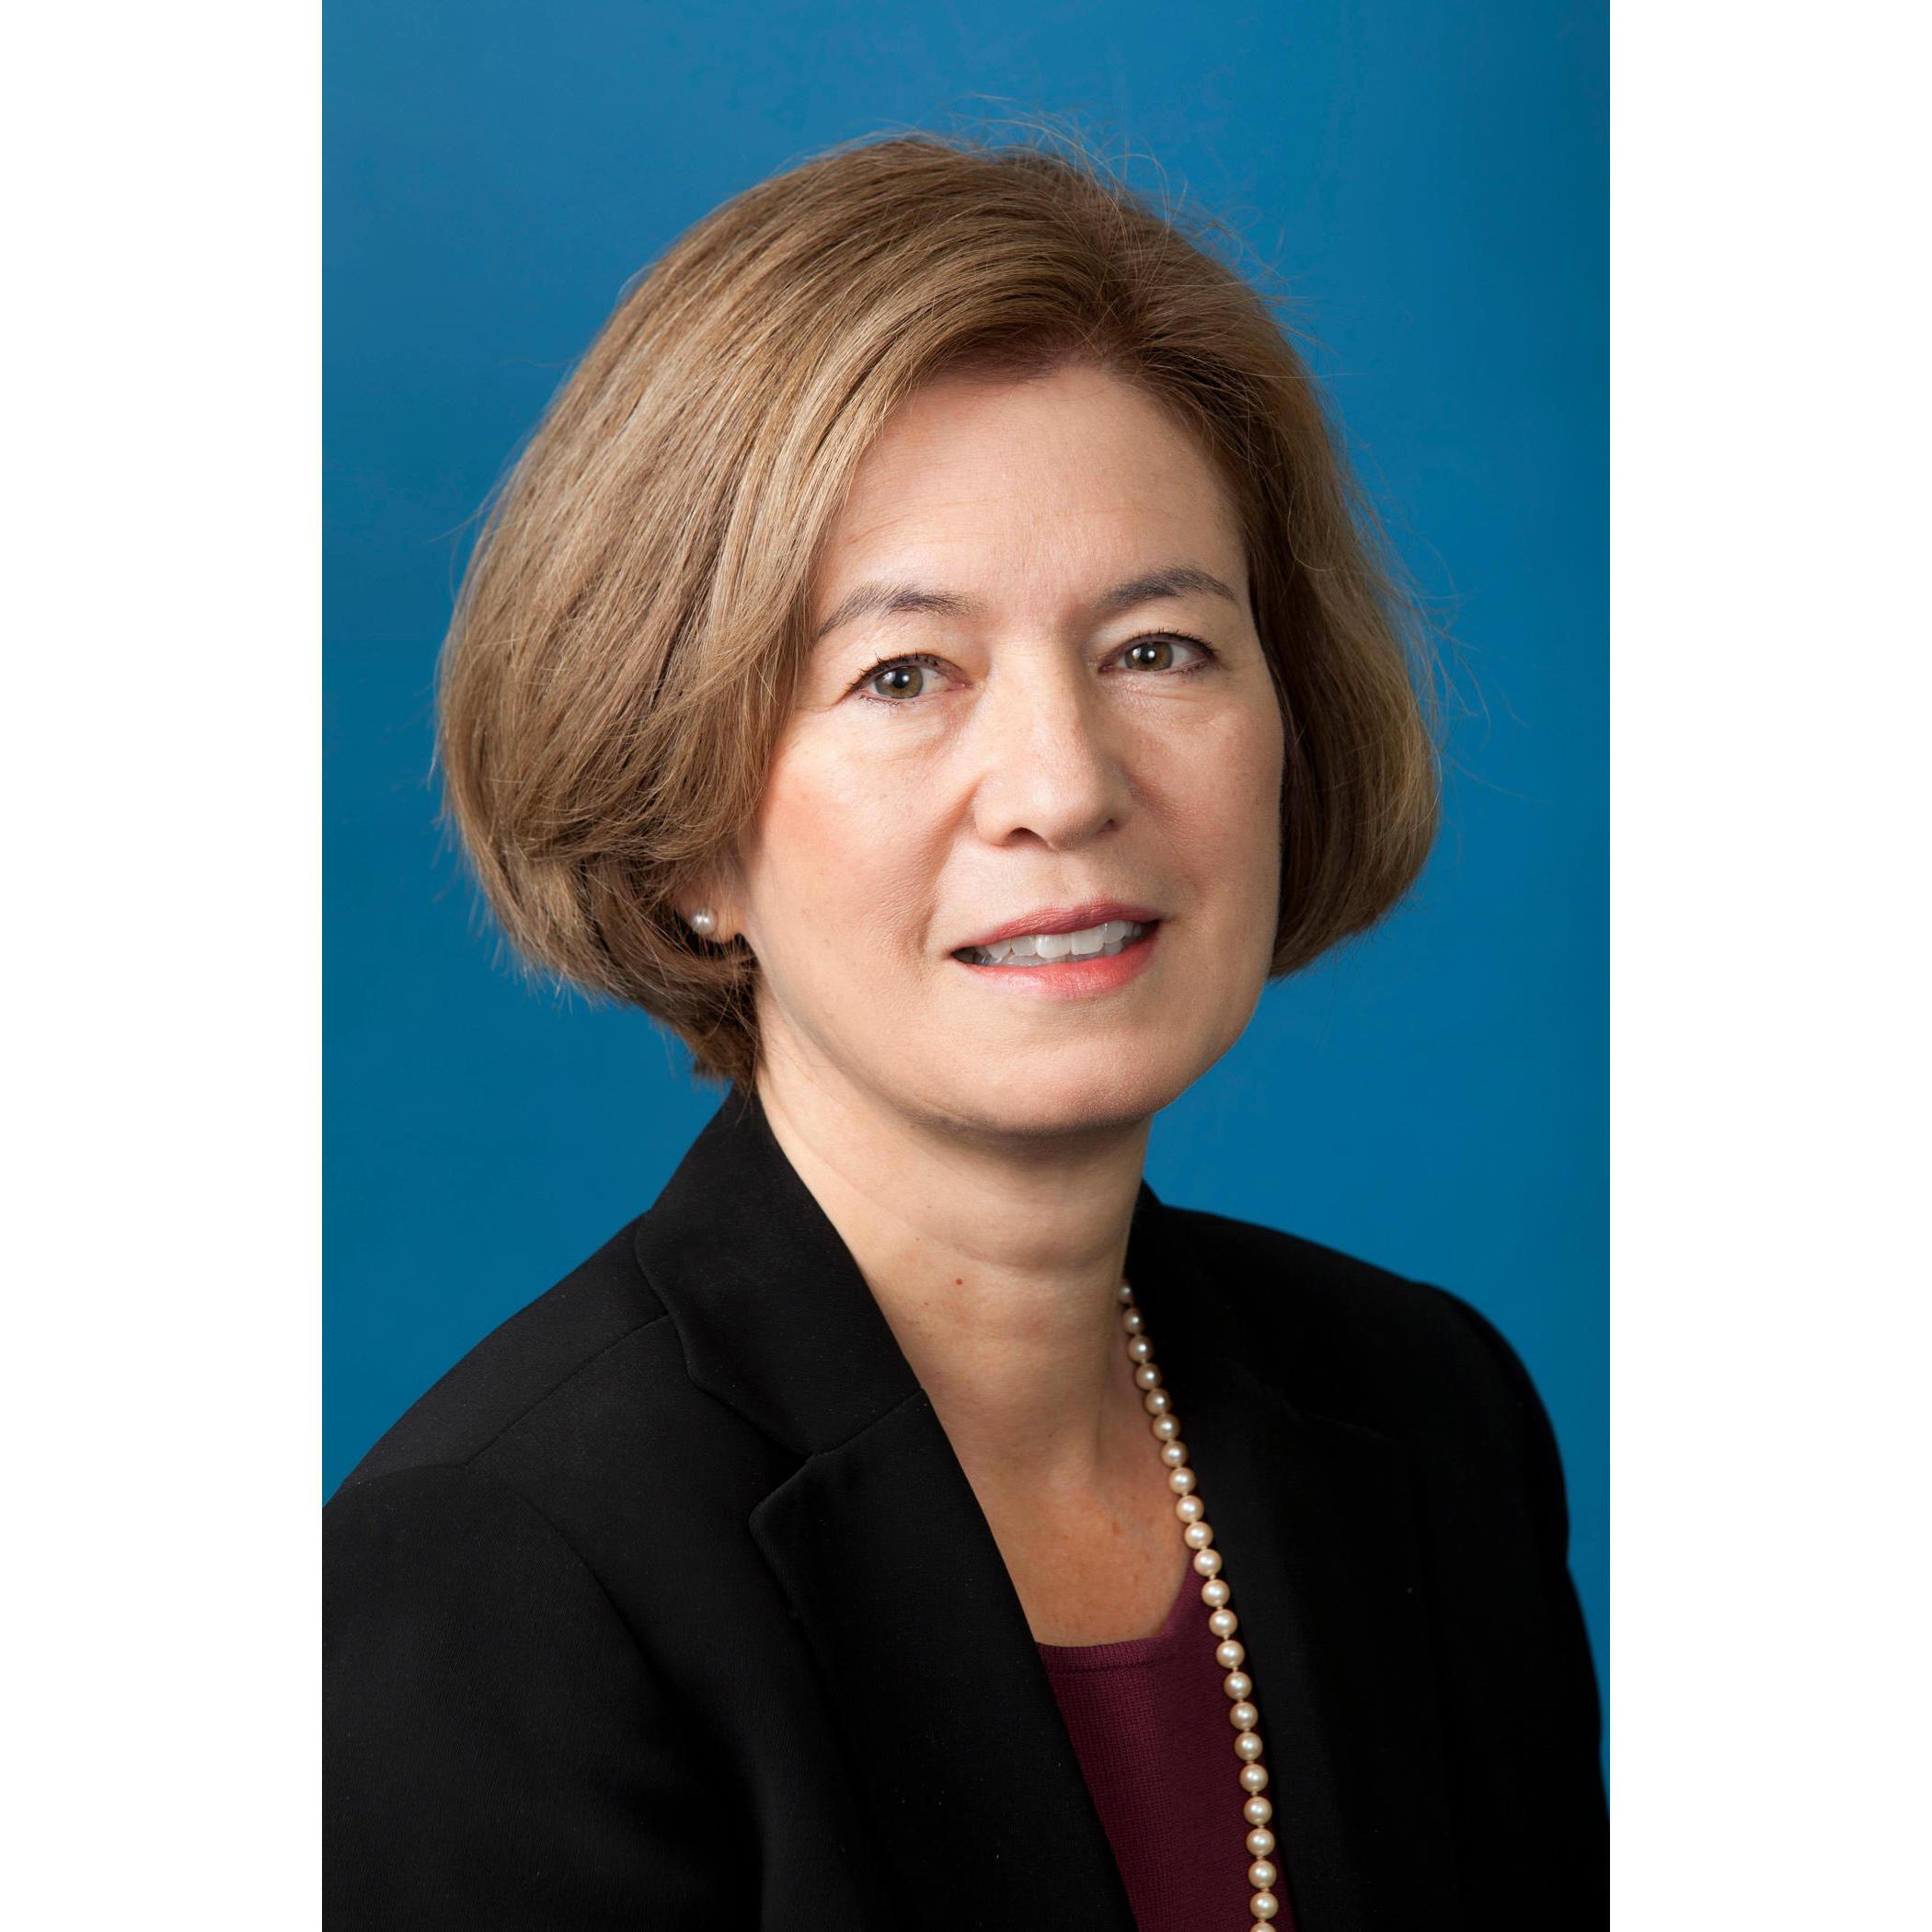 Lillian R. Meacham, MD